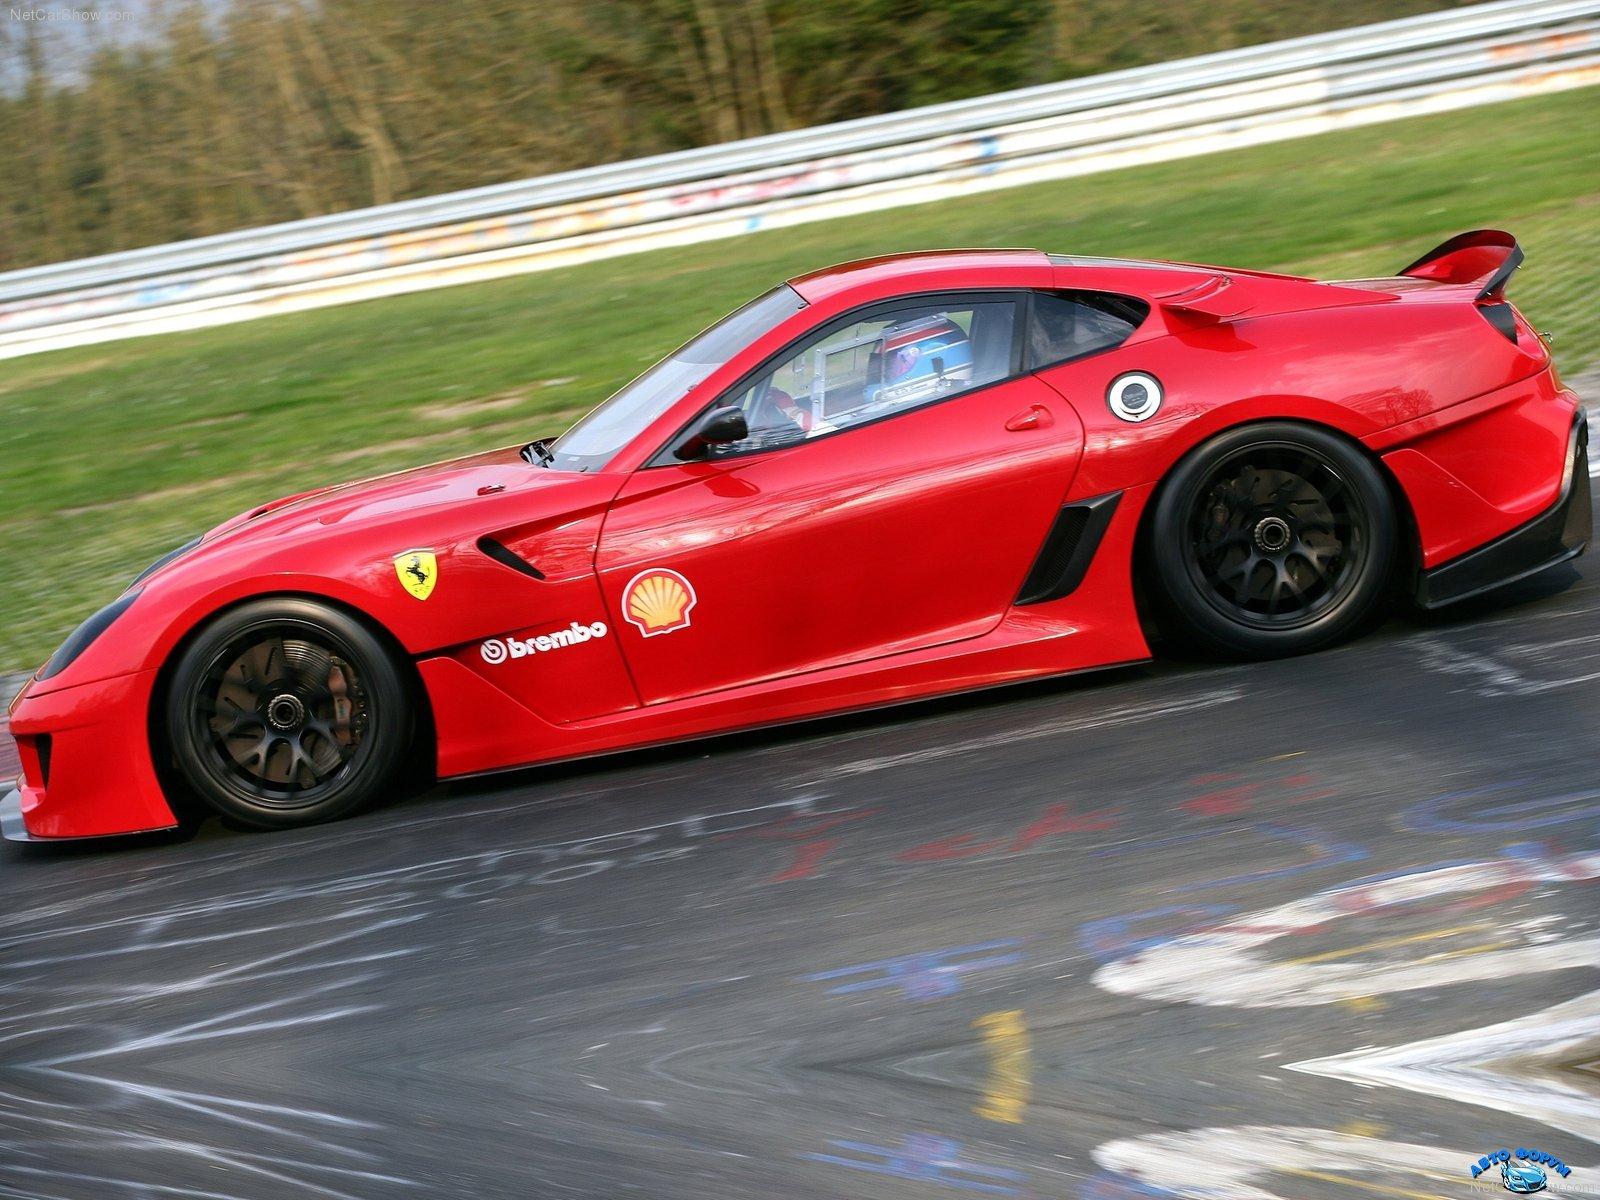 Ferrari-599XX_2010_1600x1200_wallpaper_07.jpg